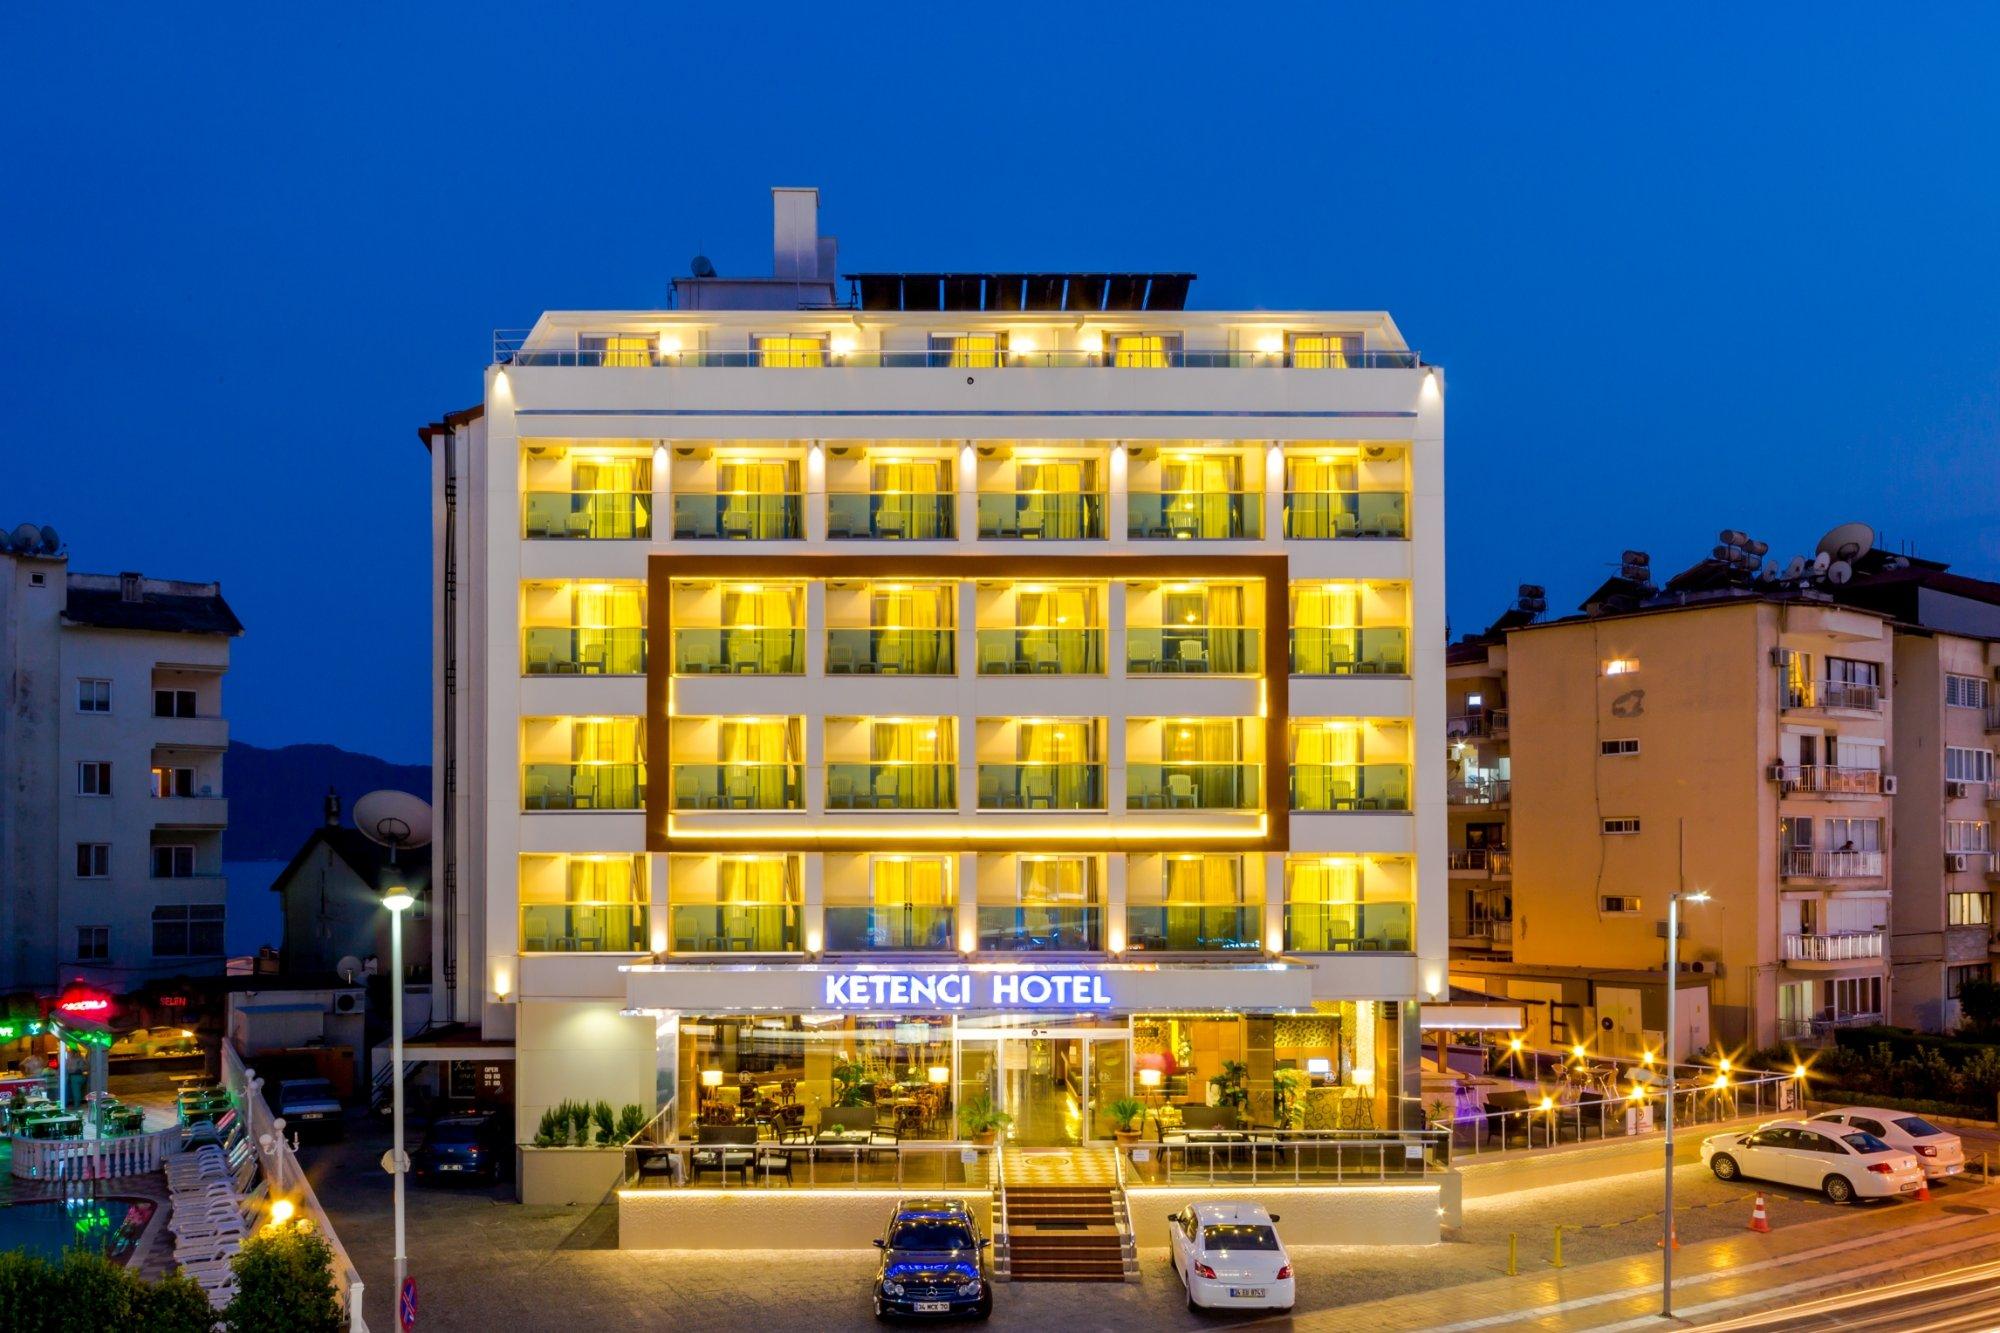 Ketenci Hotel